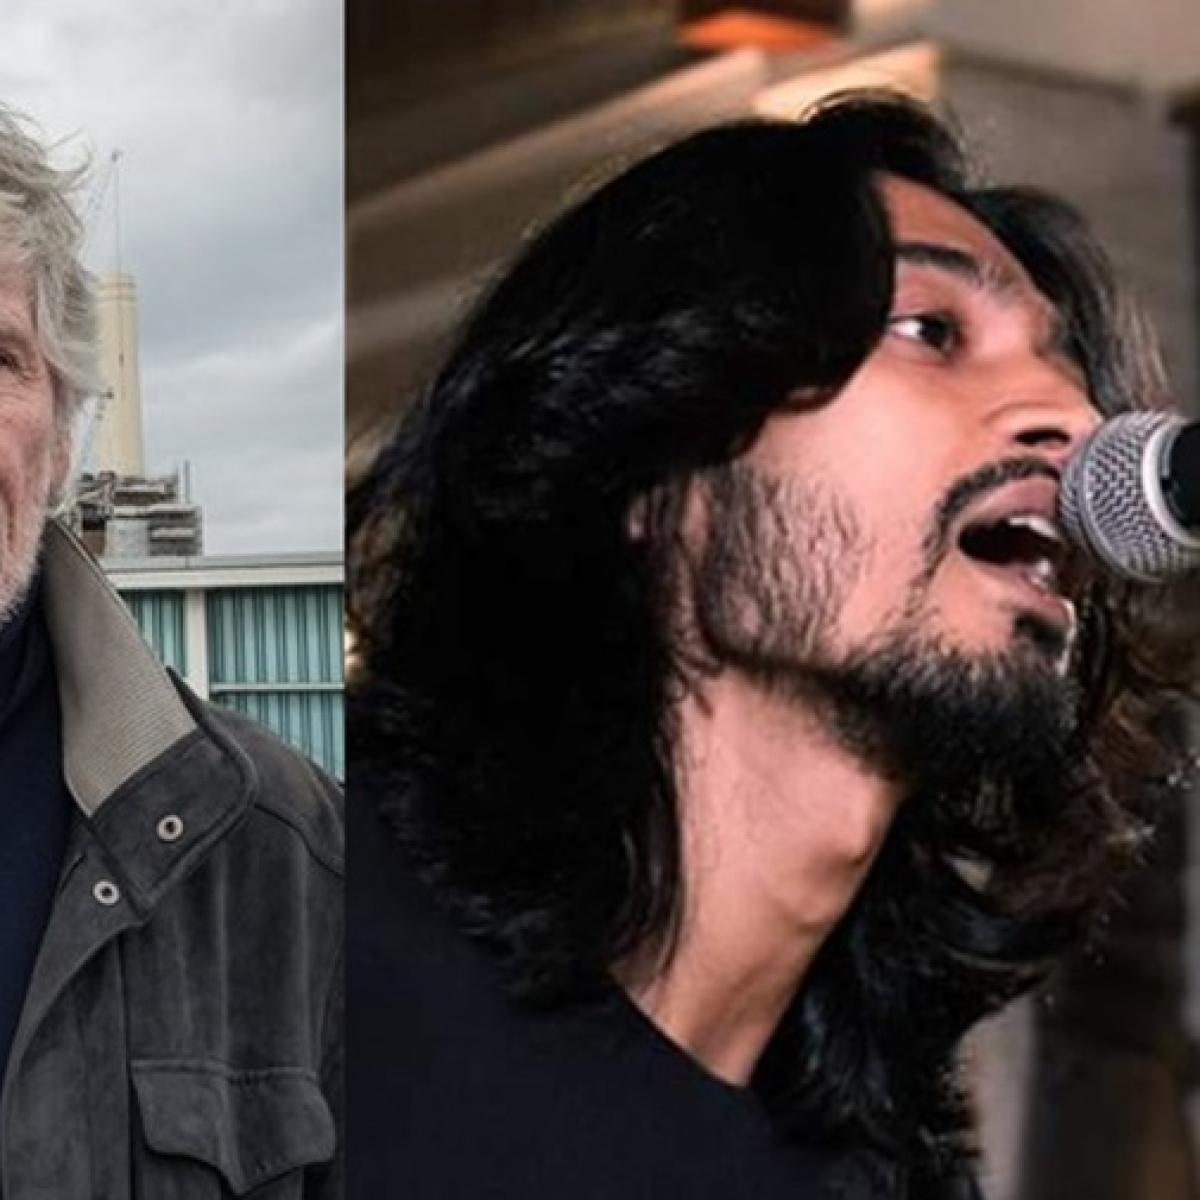 ''Sab Yaad Rakha Jaayega': Pink Floyd's Roger Waters recites poetry by Aamir Aziz, calls Modi a fascist